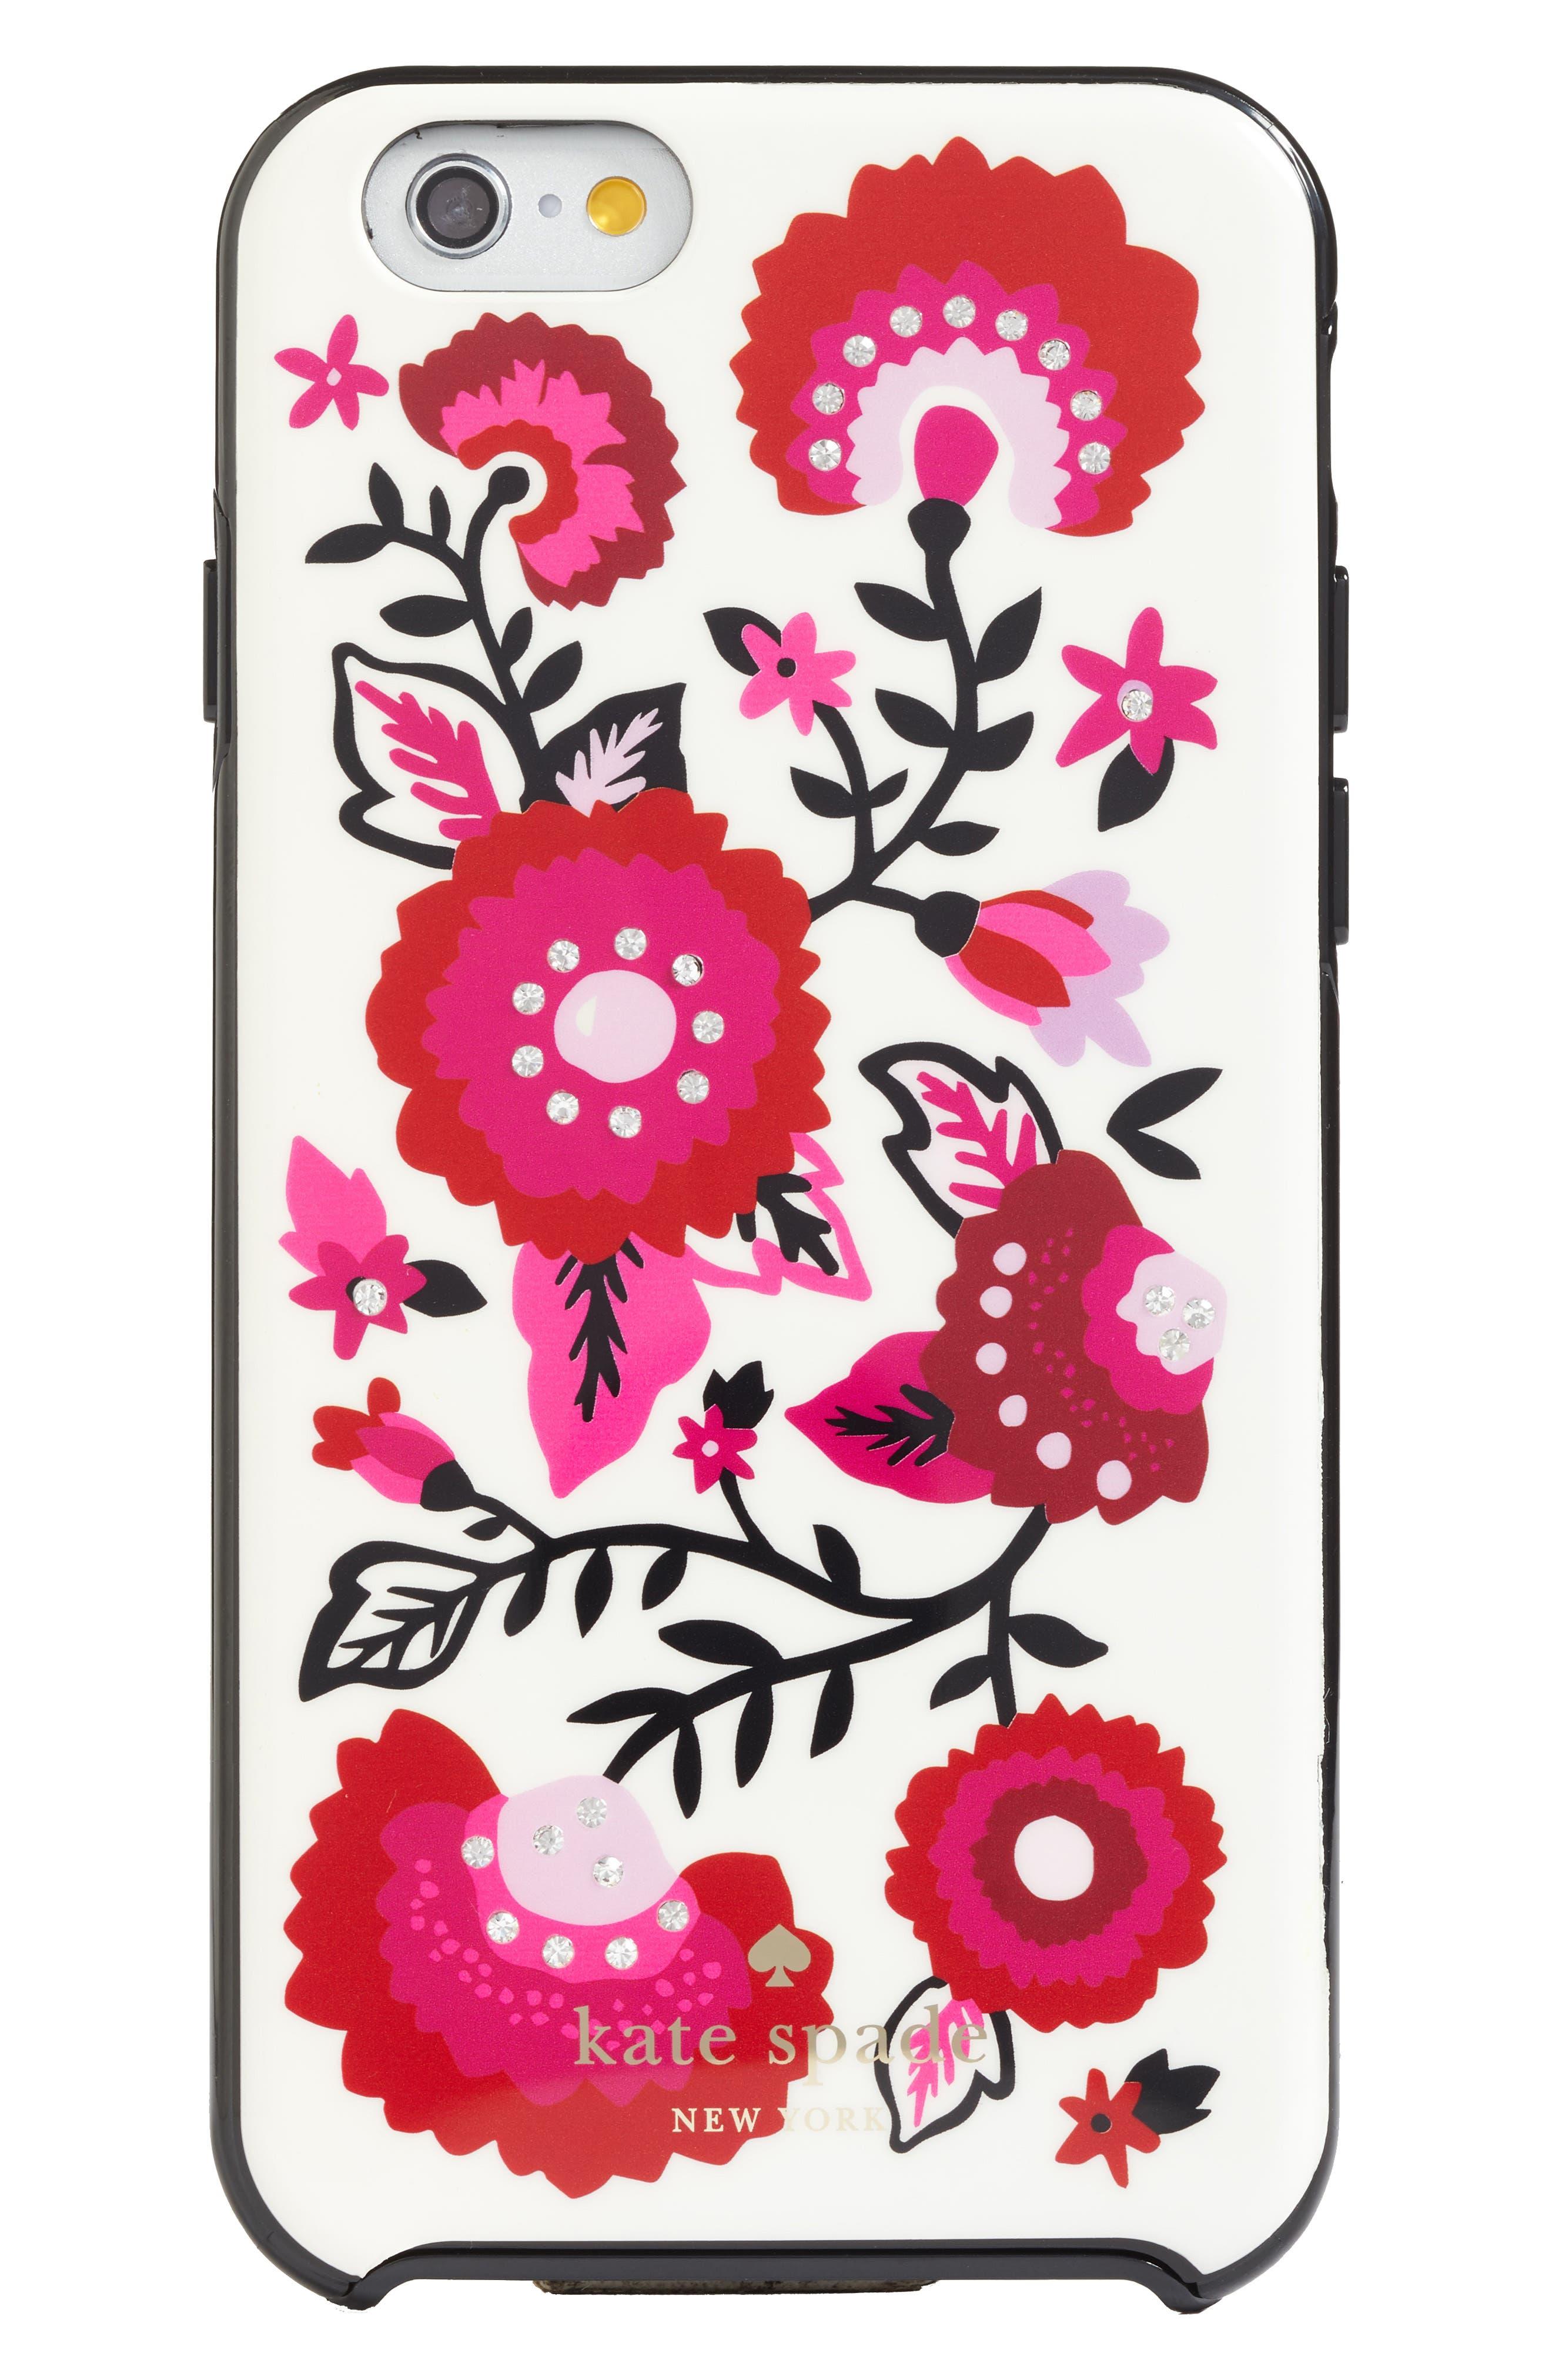 KATE SPADE NEW YORK jeweled garland iPhone 7 & 7 Plus case